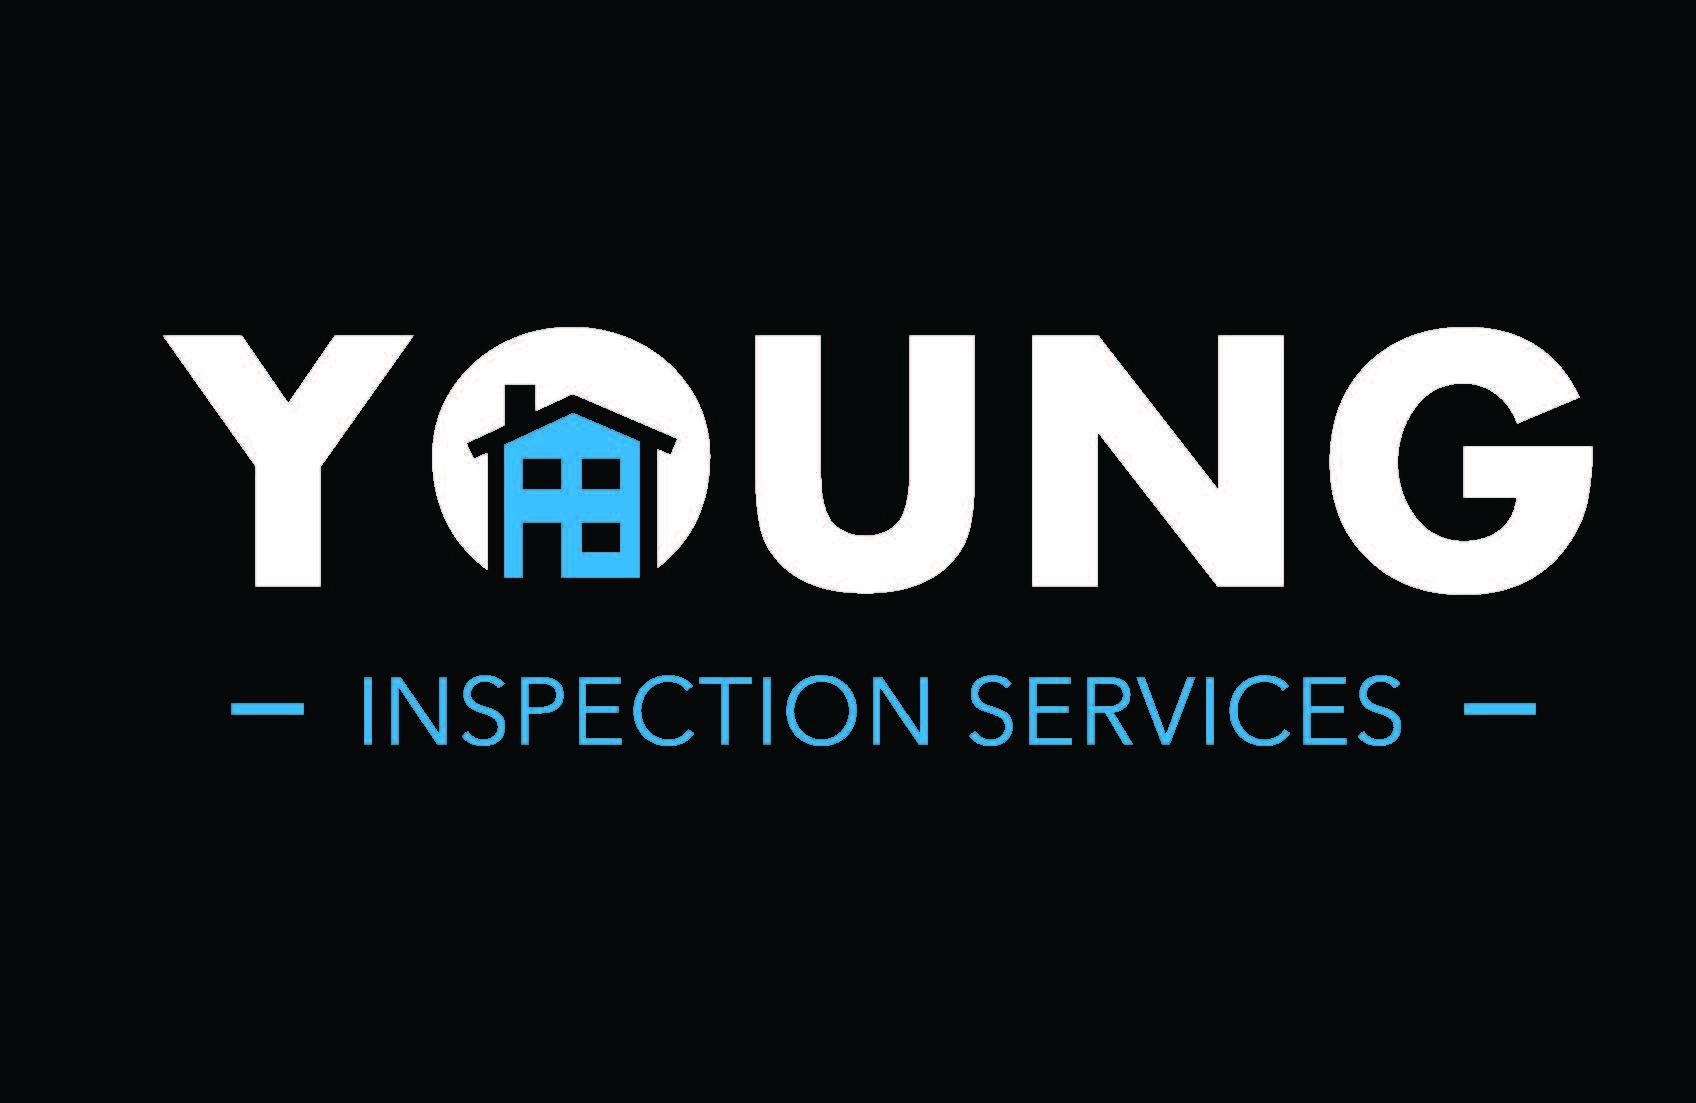 Yis logo black